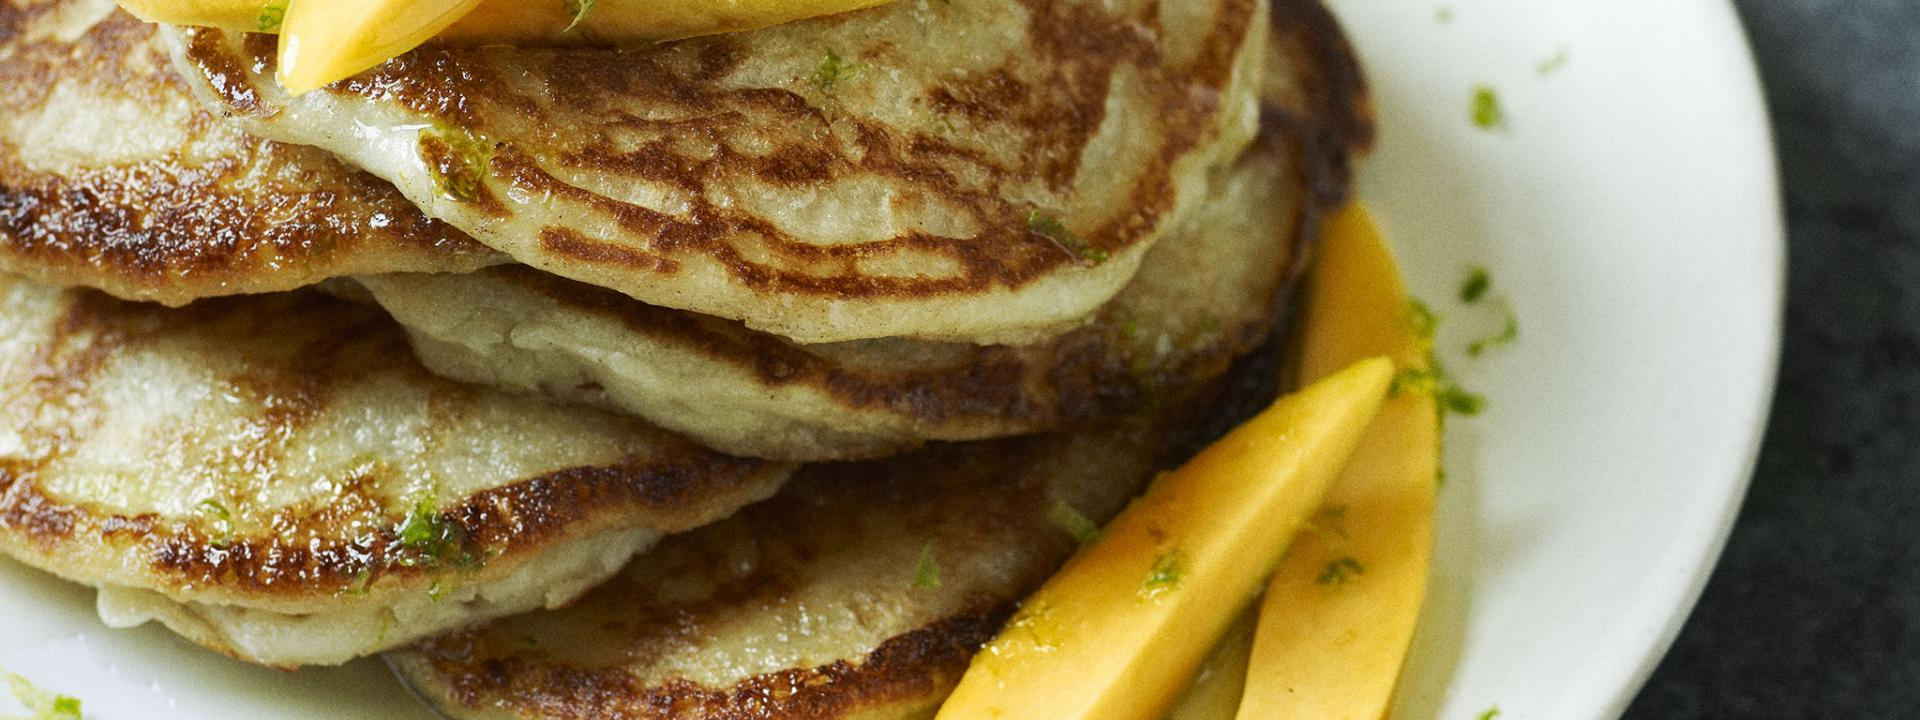 Coconut Pancakes 1665 rt